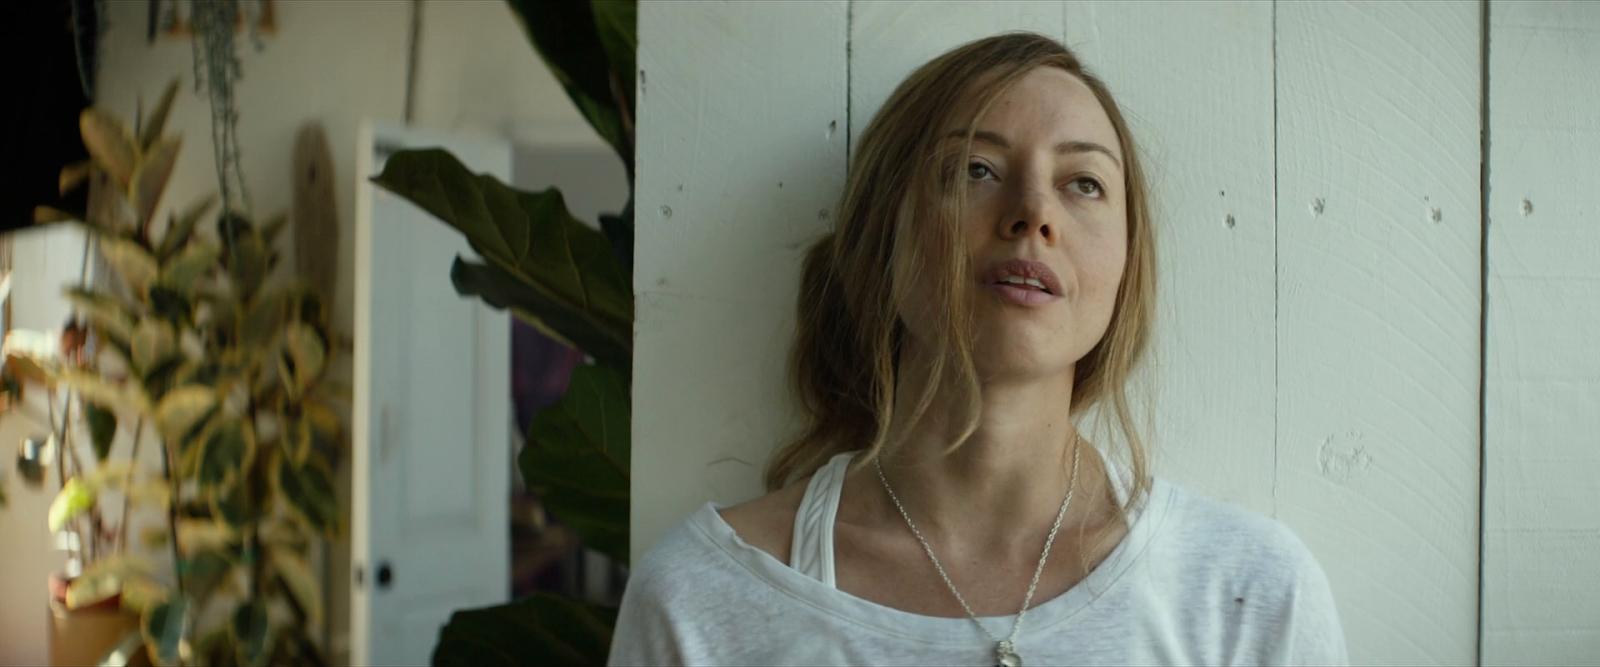 Ingrid Goes West (2017) BRRip 1080p Latino-Castellano-Ingles captura 1